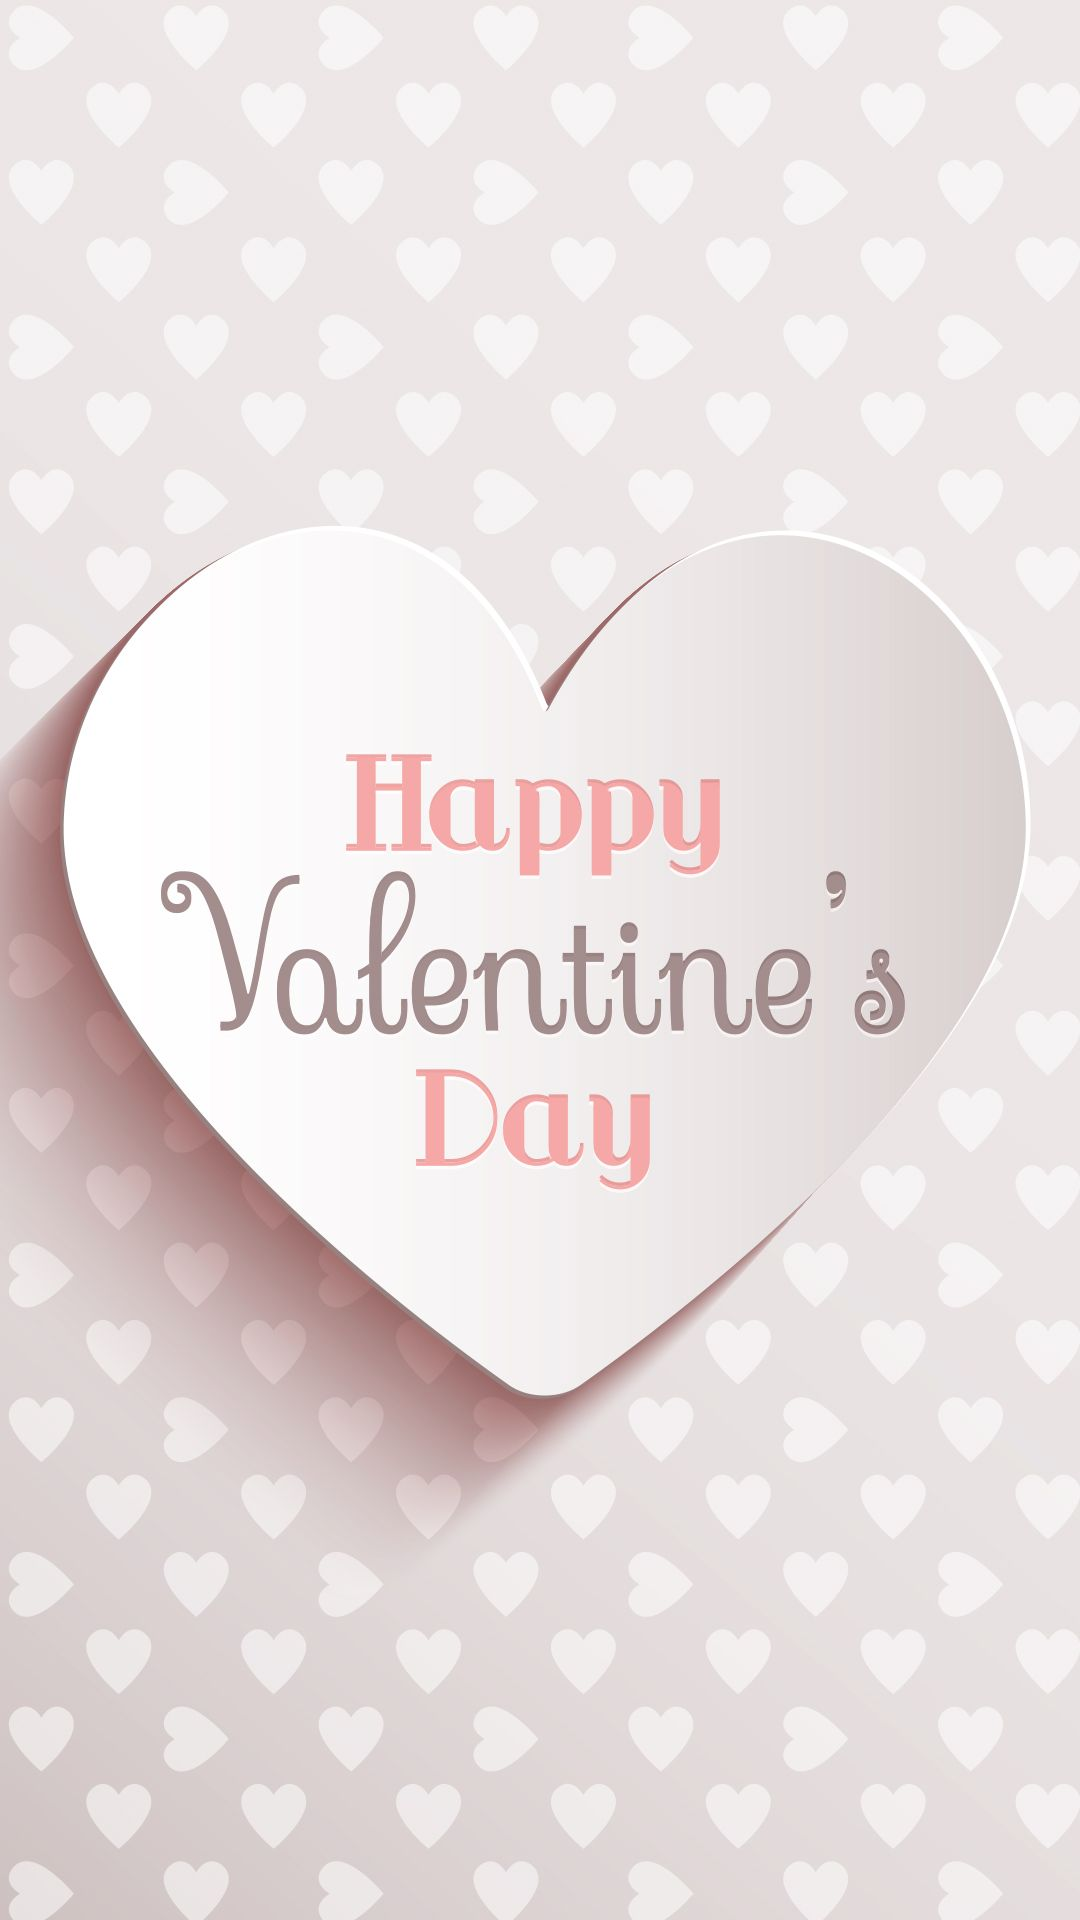 iPhoneunuz iin Sevgililer Gn wallpaperlar valentinesday 1080x1920